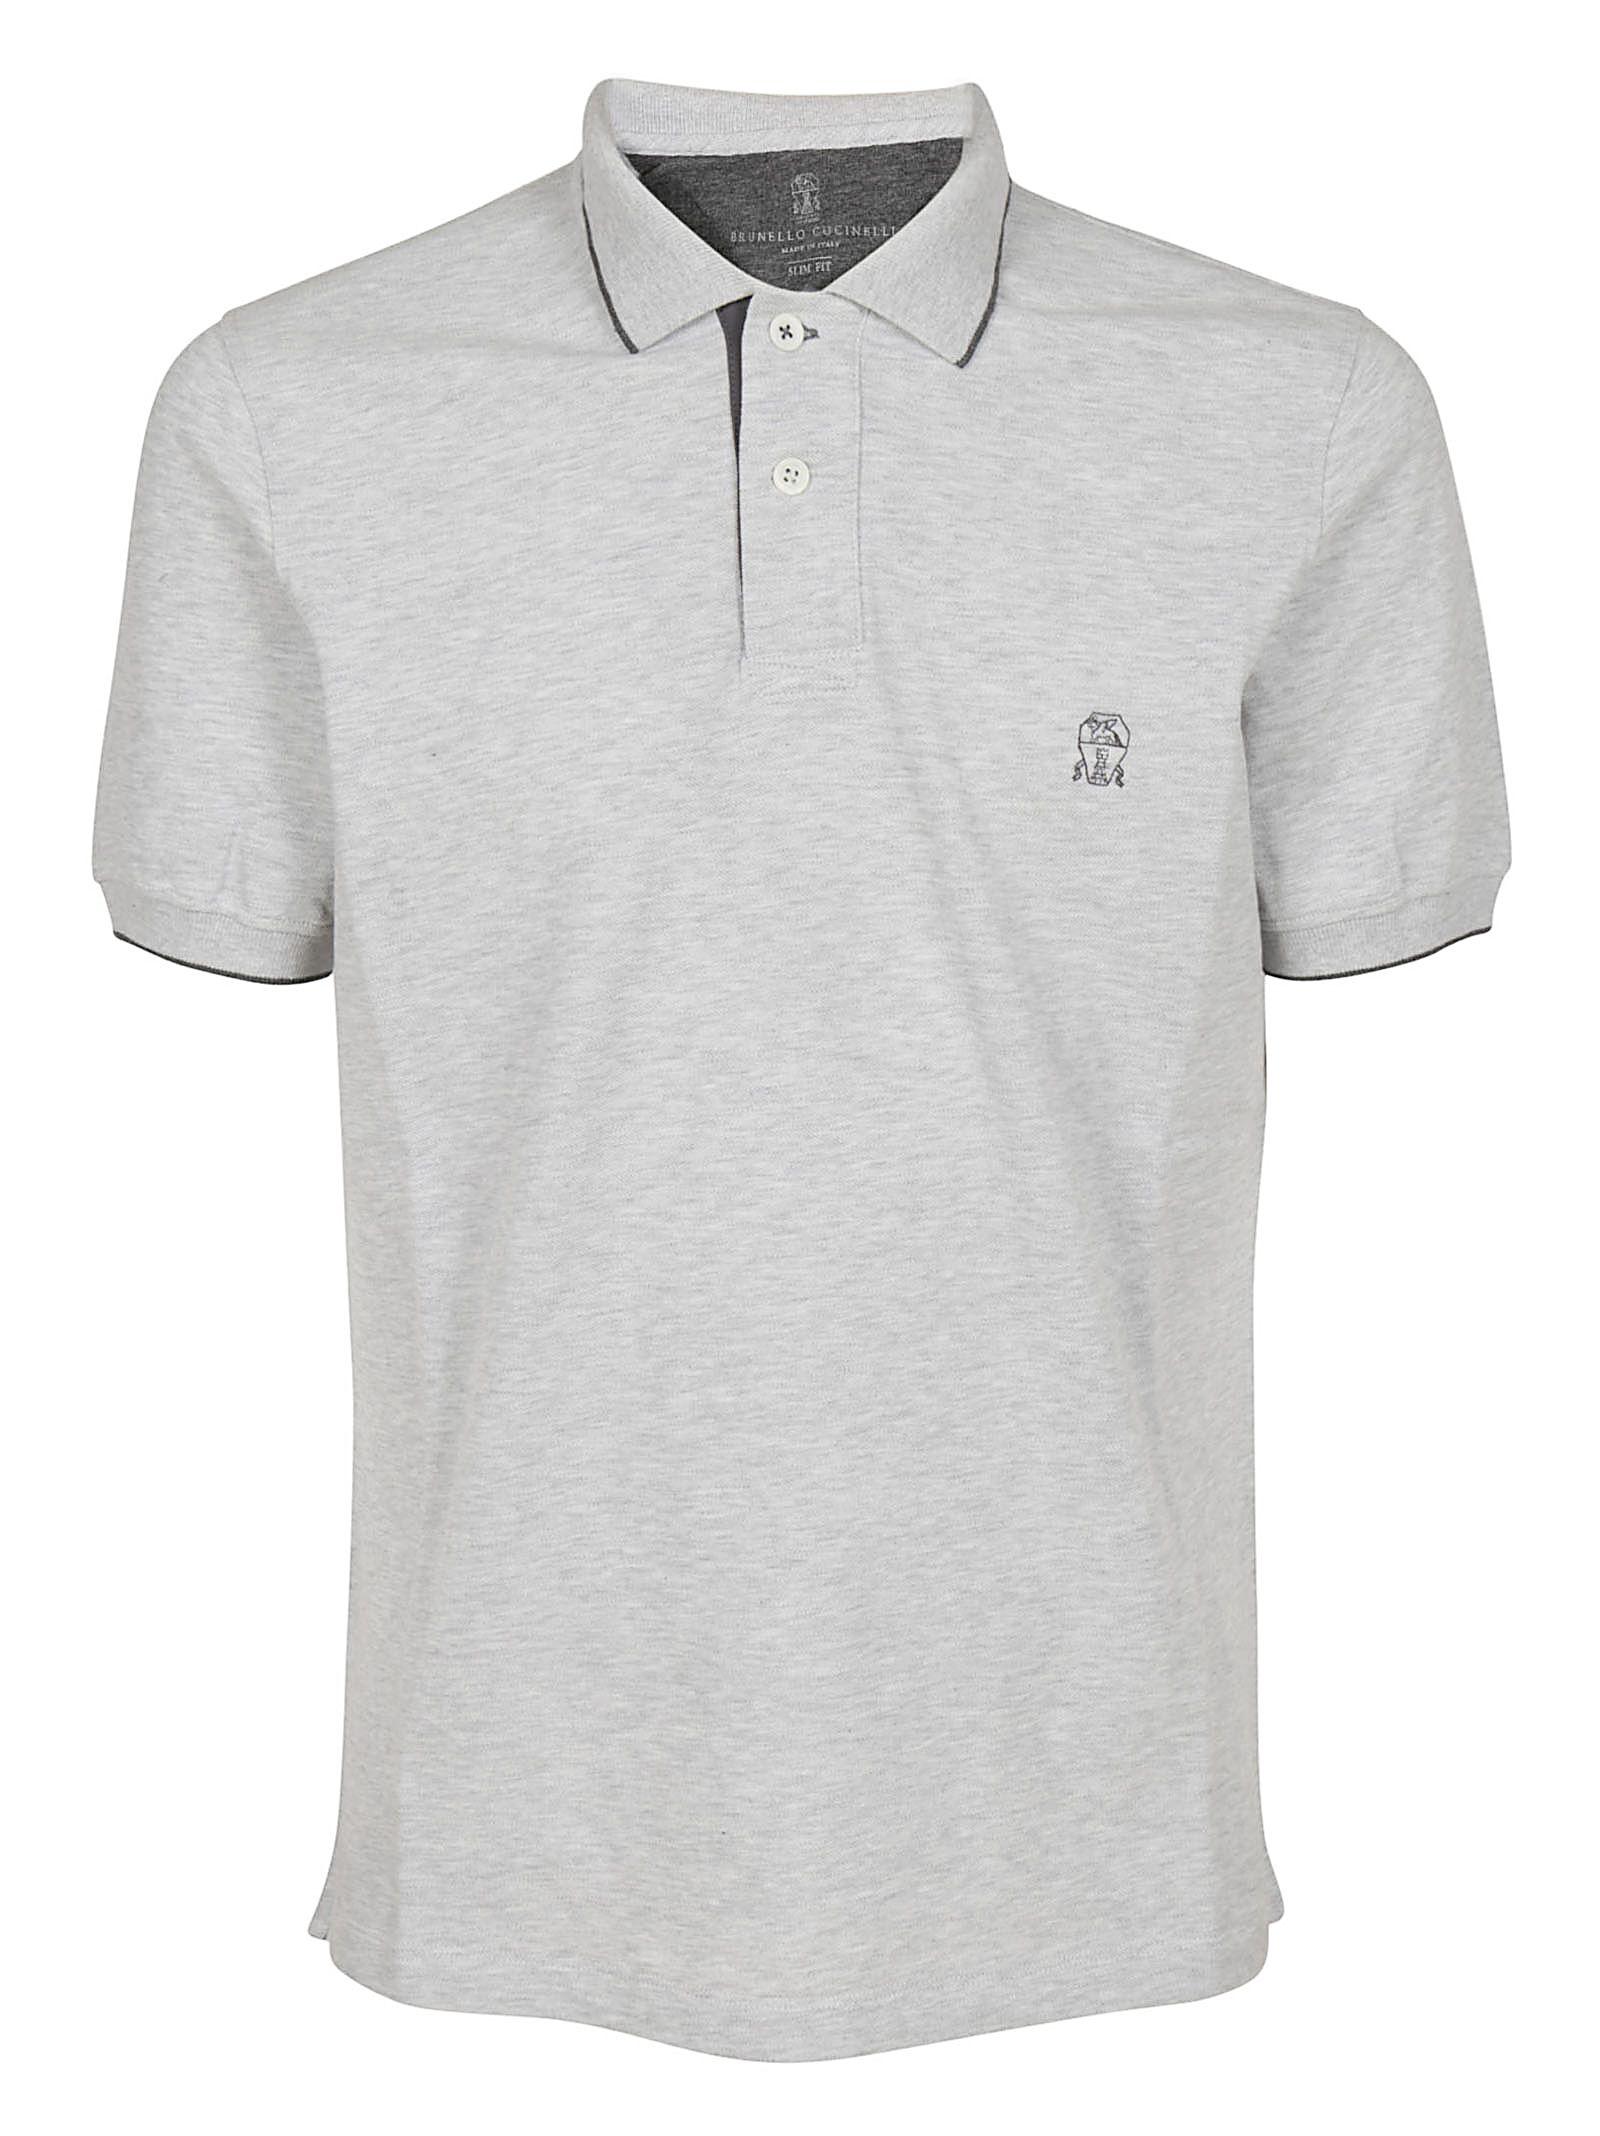 Brunello Cucinelli Brunello Cucinelli Contrast Detailing Polo Shirt